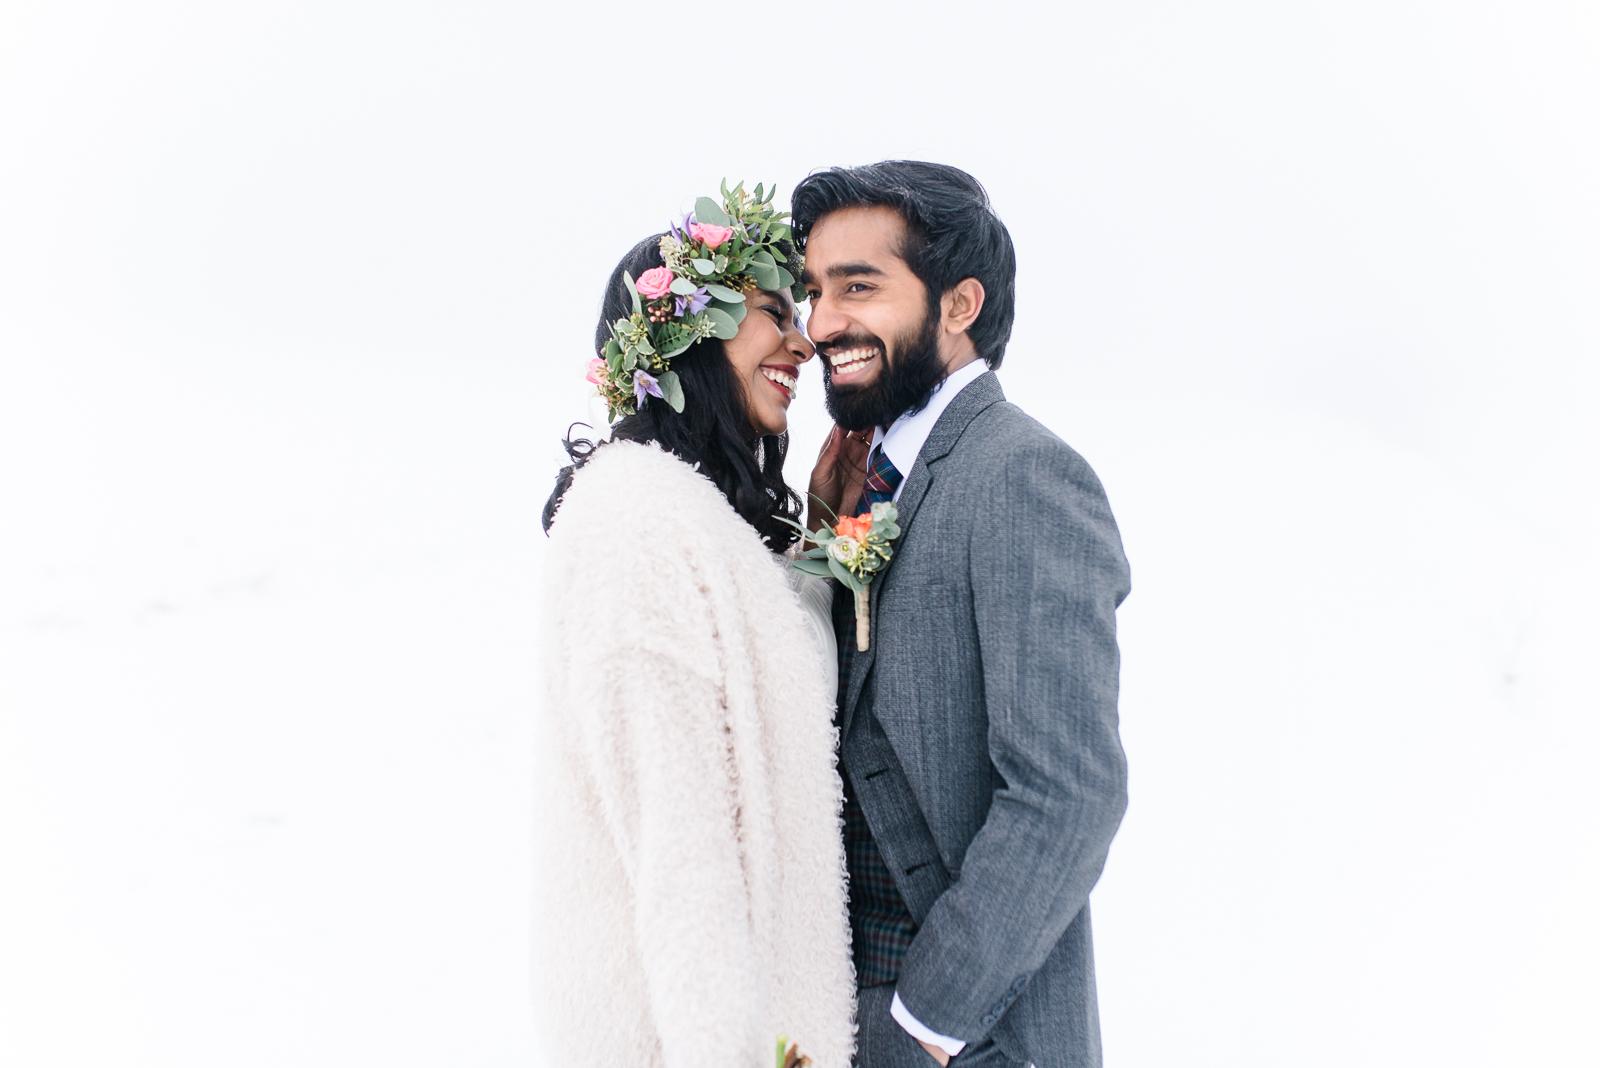 Boho After wedding Shooting Fränkische Schweiz